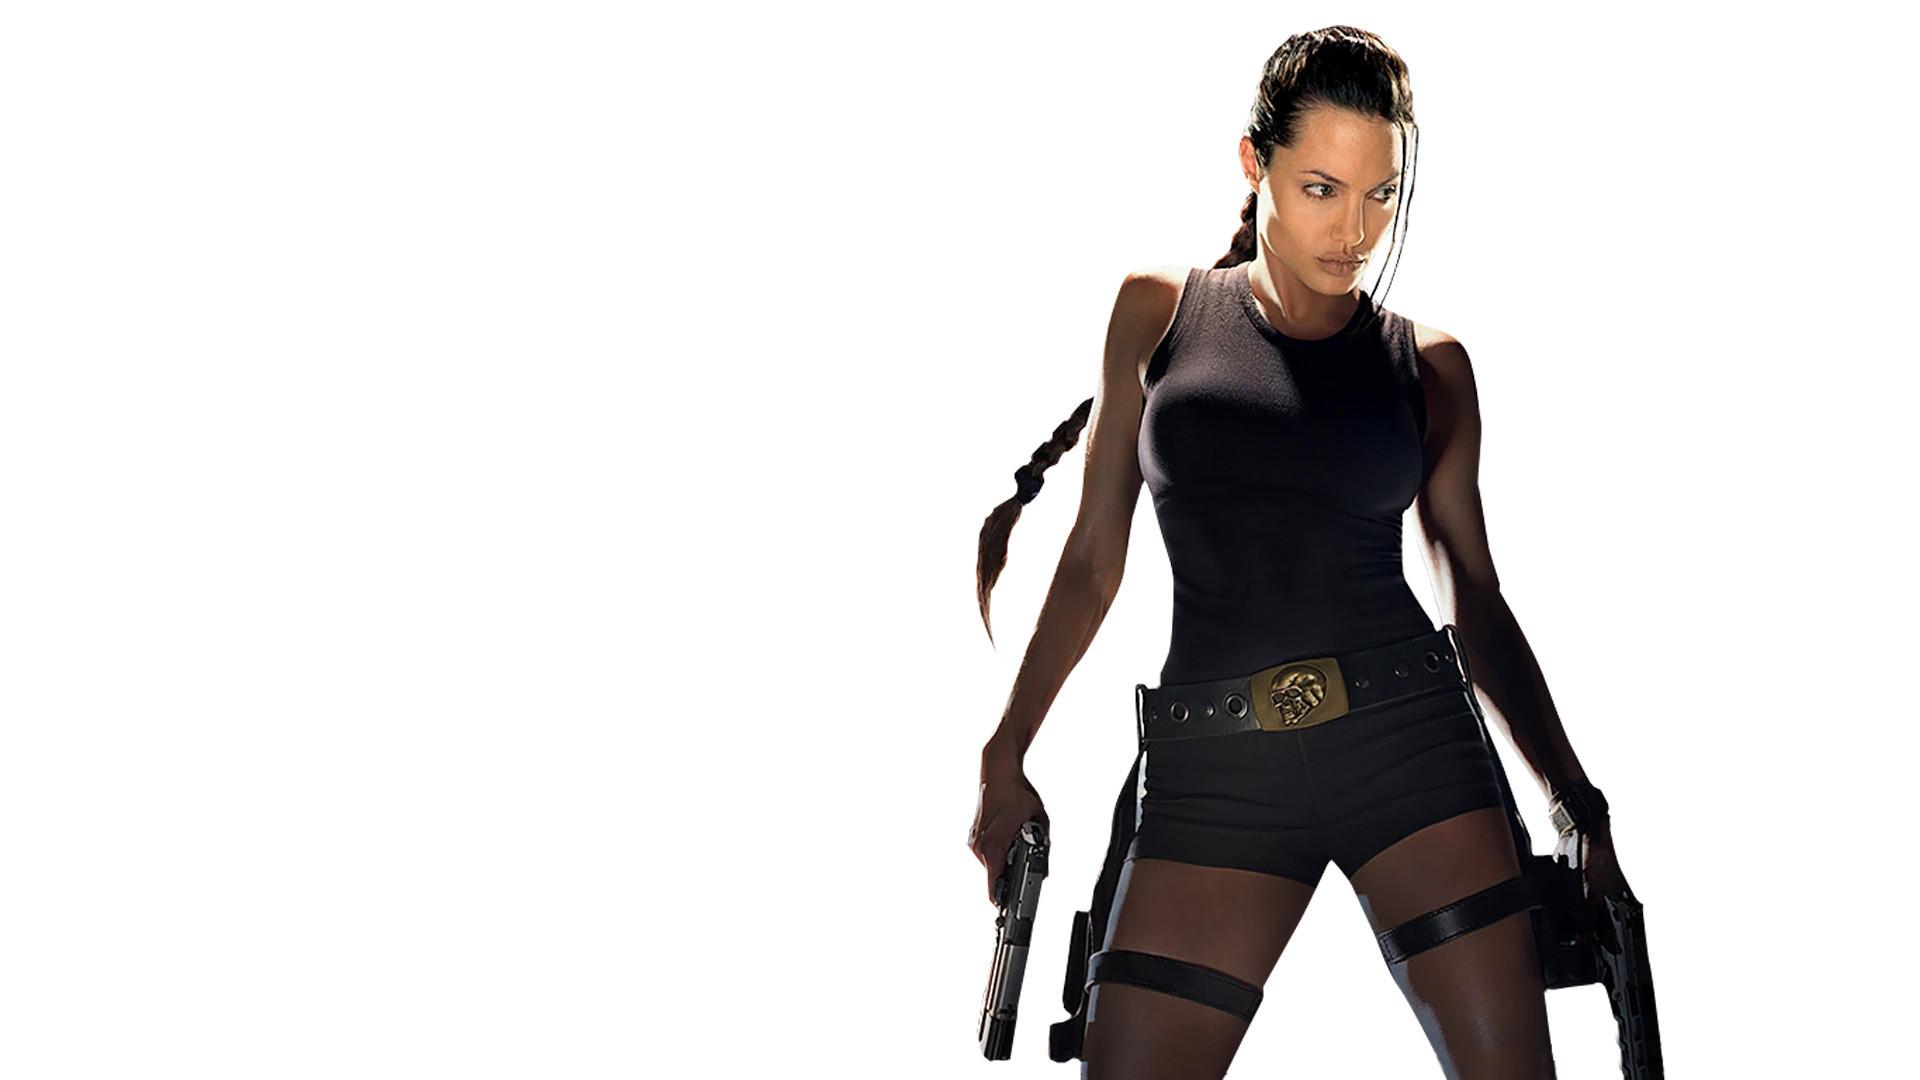 Most Viewed Lara Croft Tomb Raider Wallpapers 4k Wallpapers